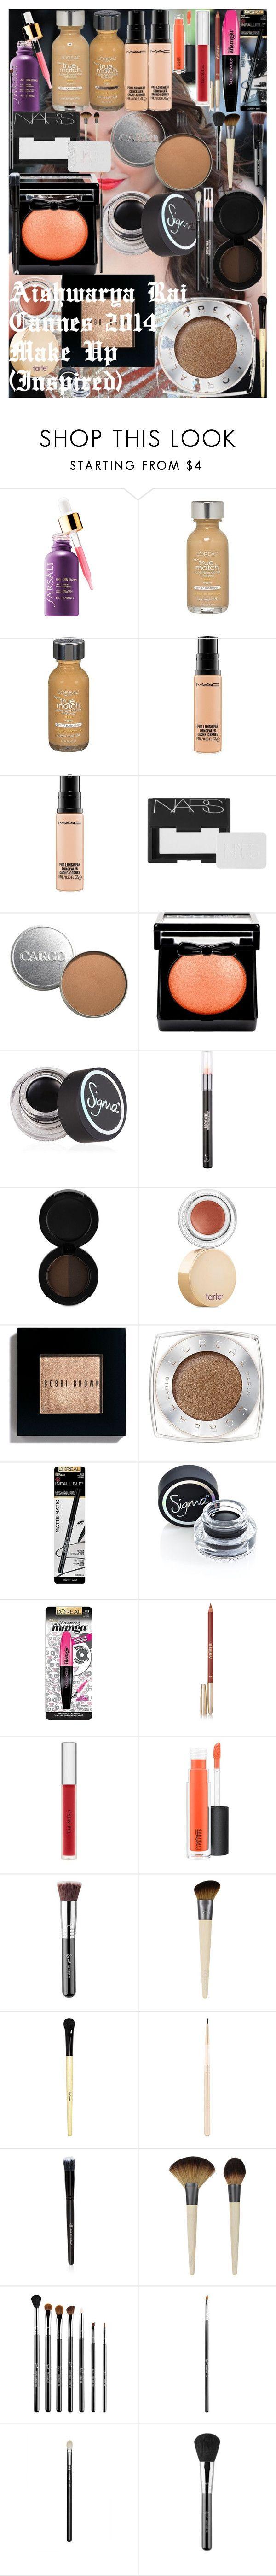 """Aishwarya Rai Cannes 2014 Make Up (Inspired)"" by oroartye-1 on Polyvore featuring beauty, Amrapali, L'Oréal Paris, MAC Cosmetics, NARS Cosmetics, CARGO, NYX, Sigma, tarte and Bobbi Brown Cosmetics"